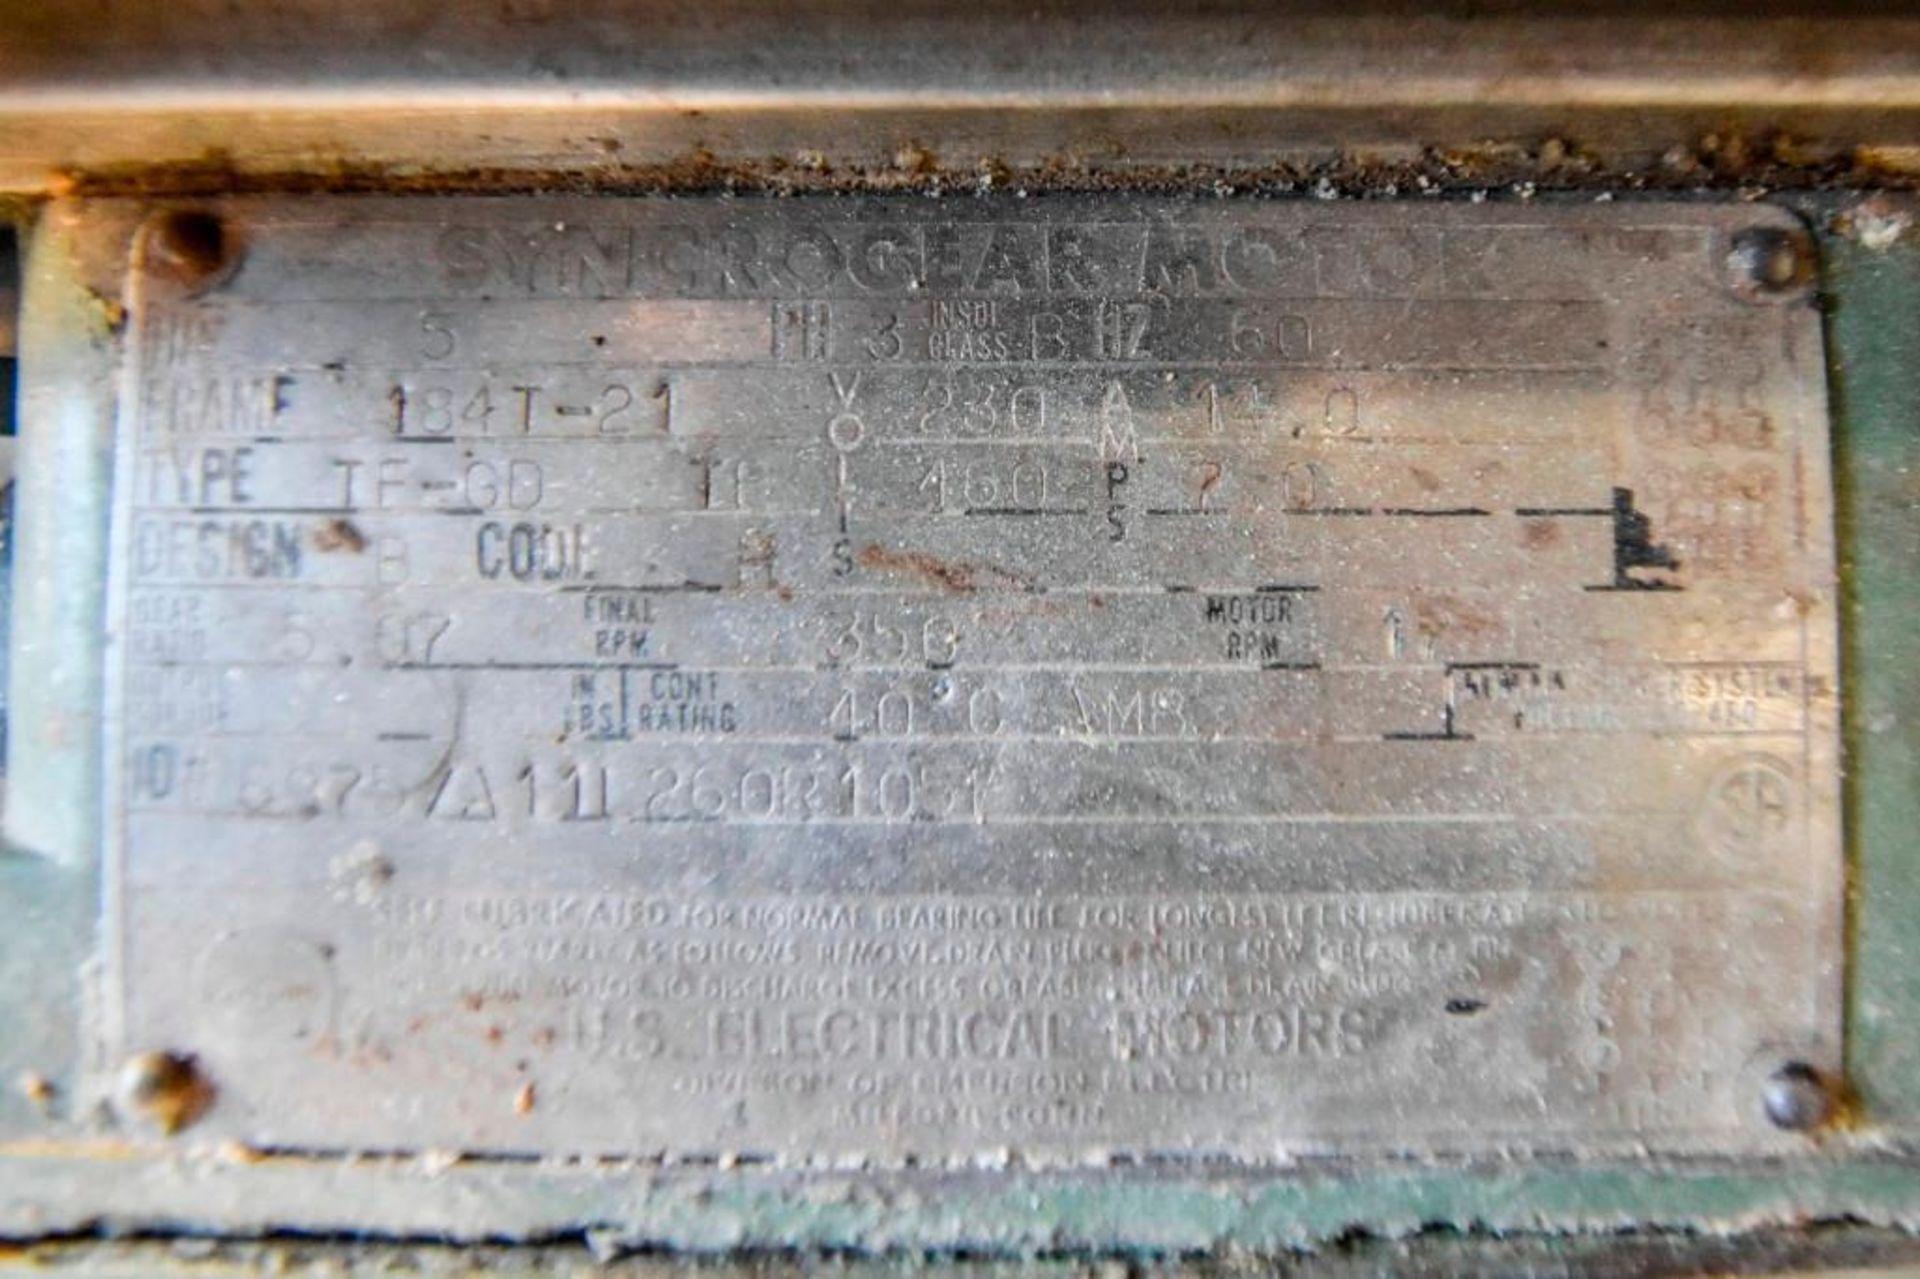 Cherry Burrel Positive Displacement Pump MDL 040 - Image 15 of 16